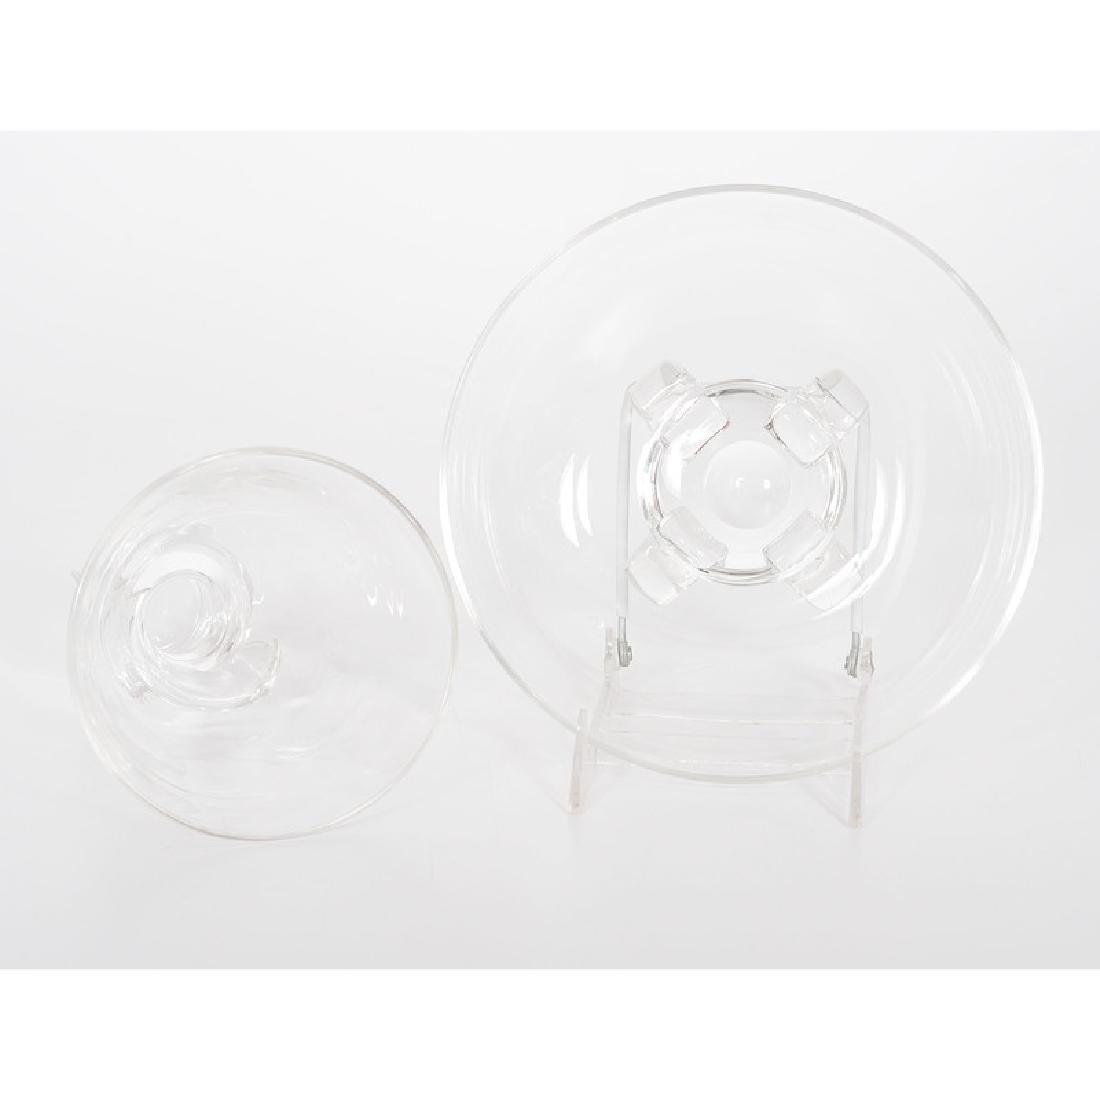 Steuben Crystal Vase and Bowl - 5